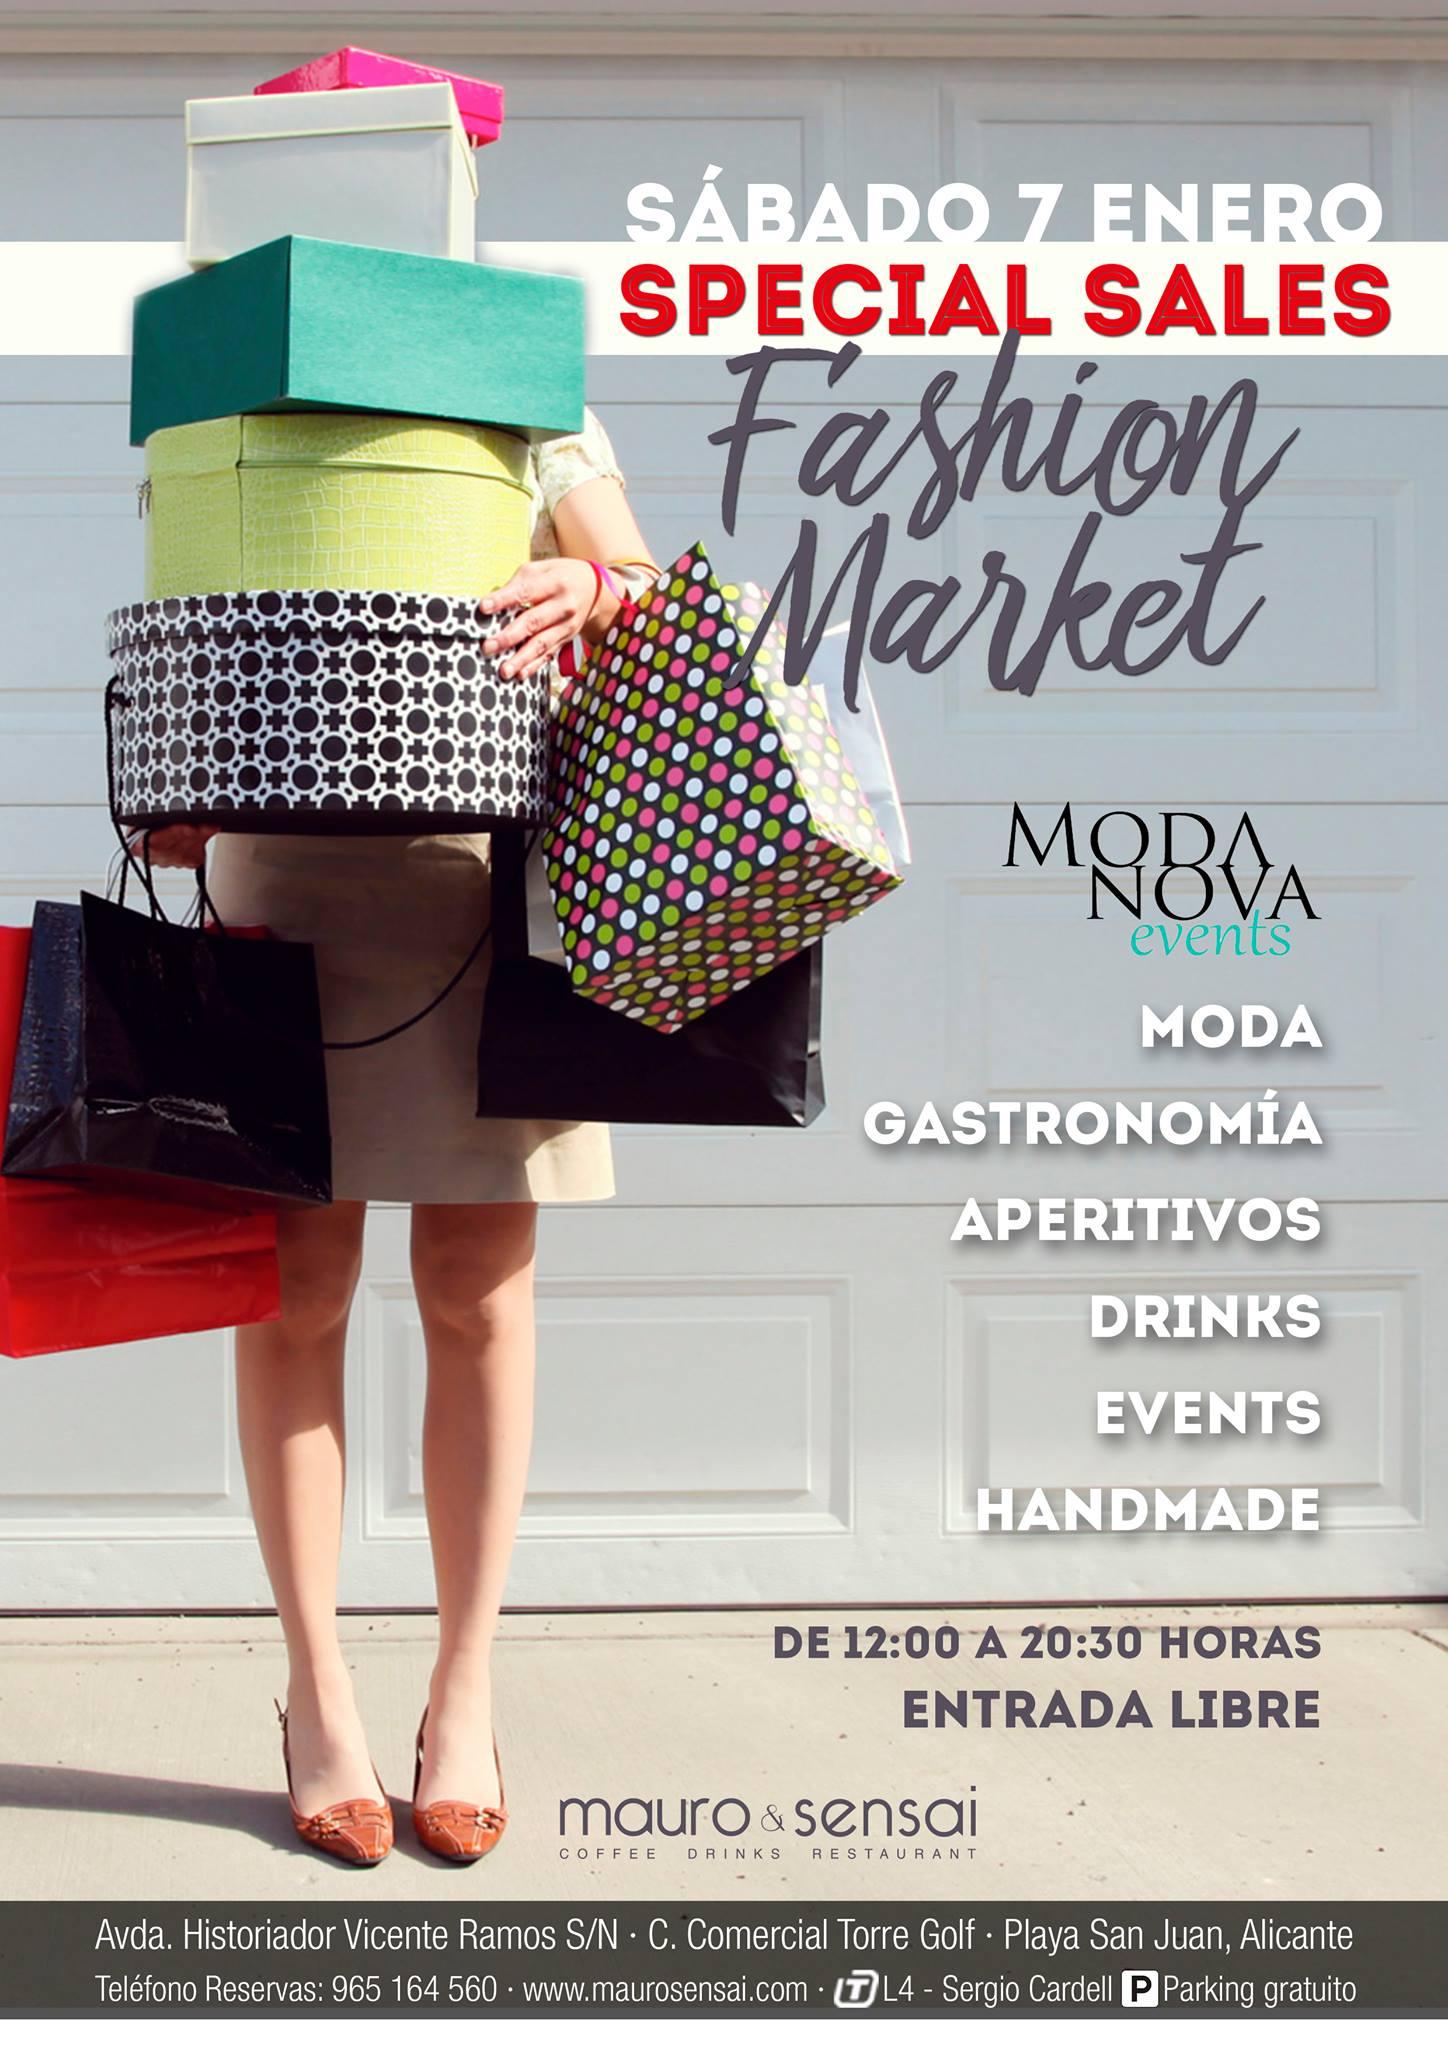 Fashion_Market_ModaNovaEvents